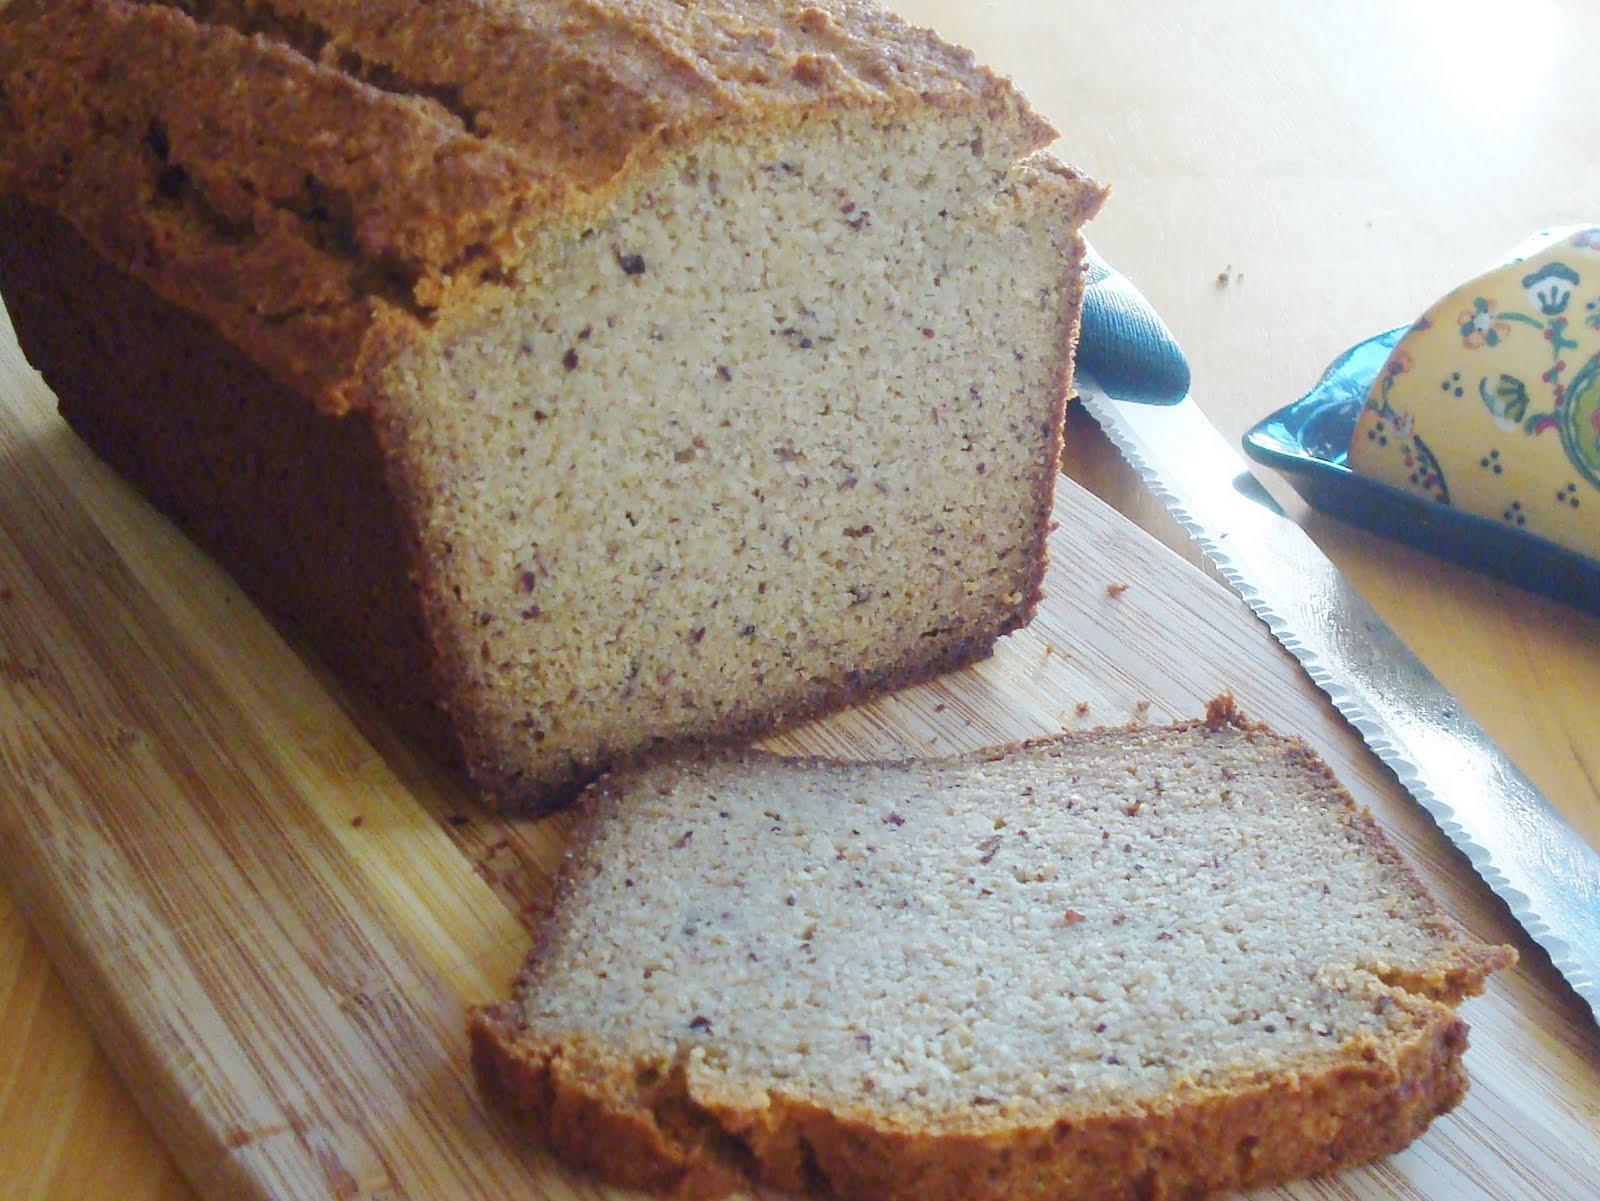 chacha's gluten free kitchen: Elana's Paleo Bread - Yum!